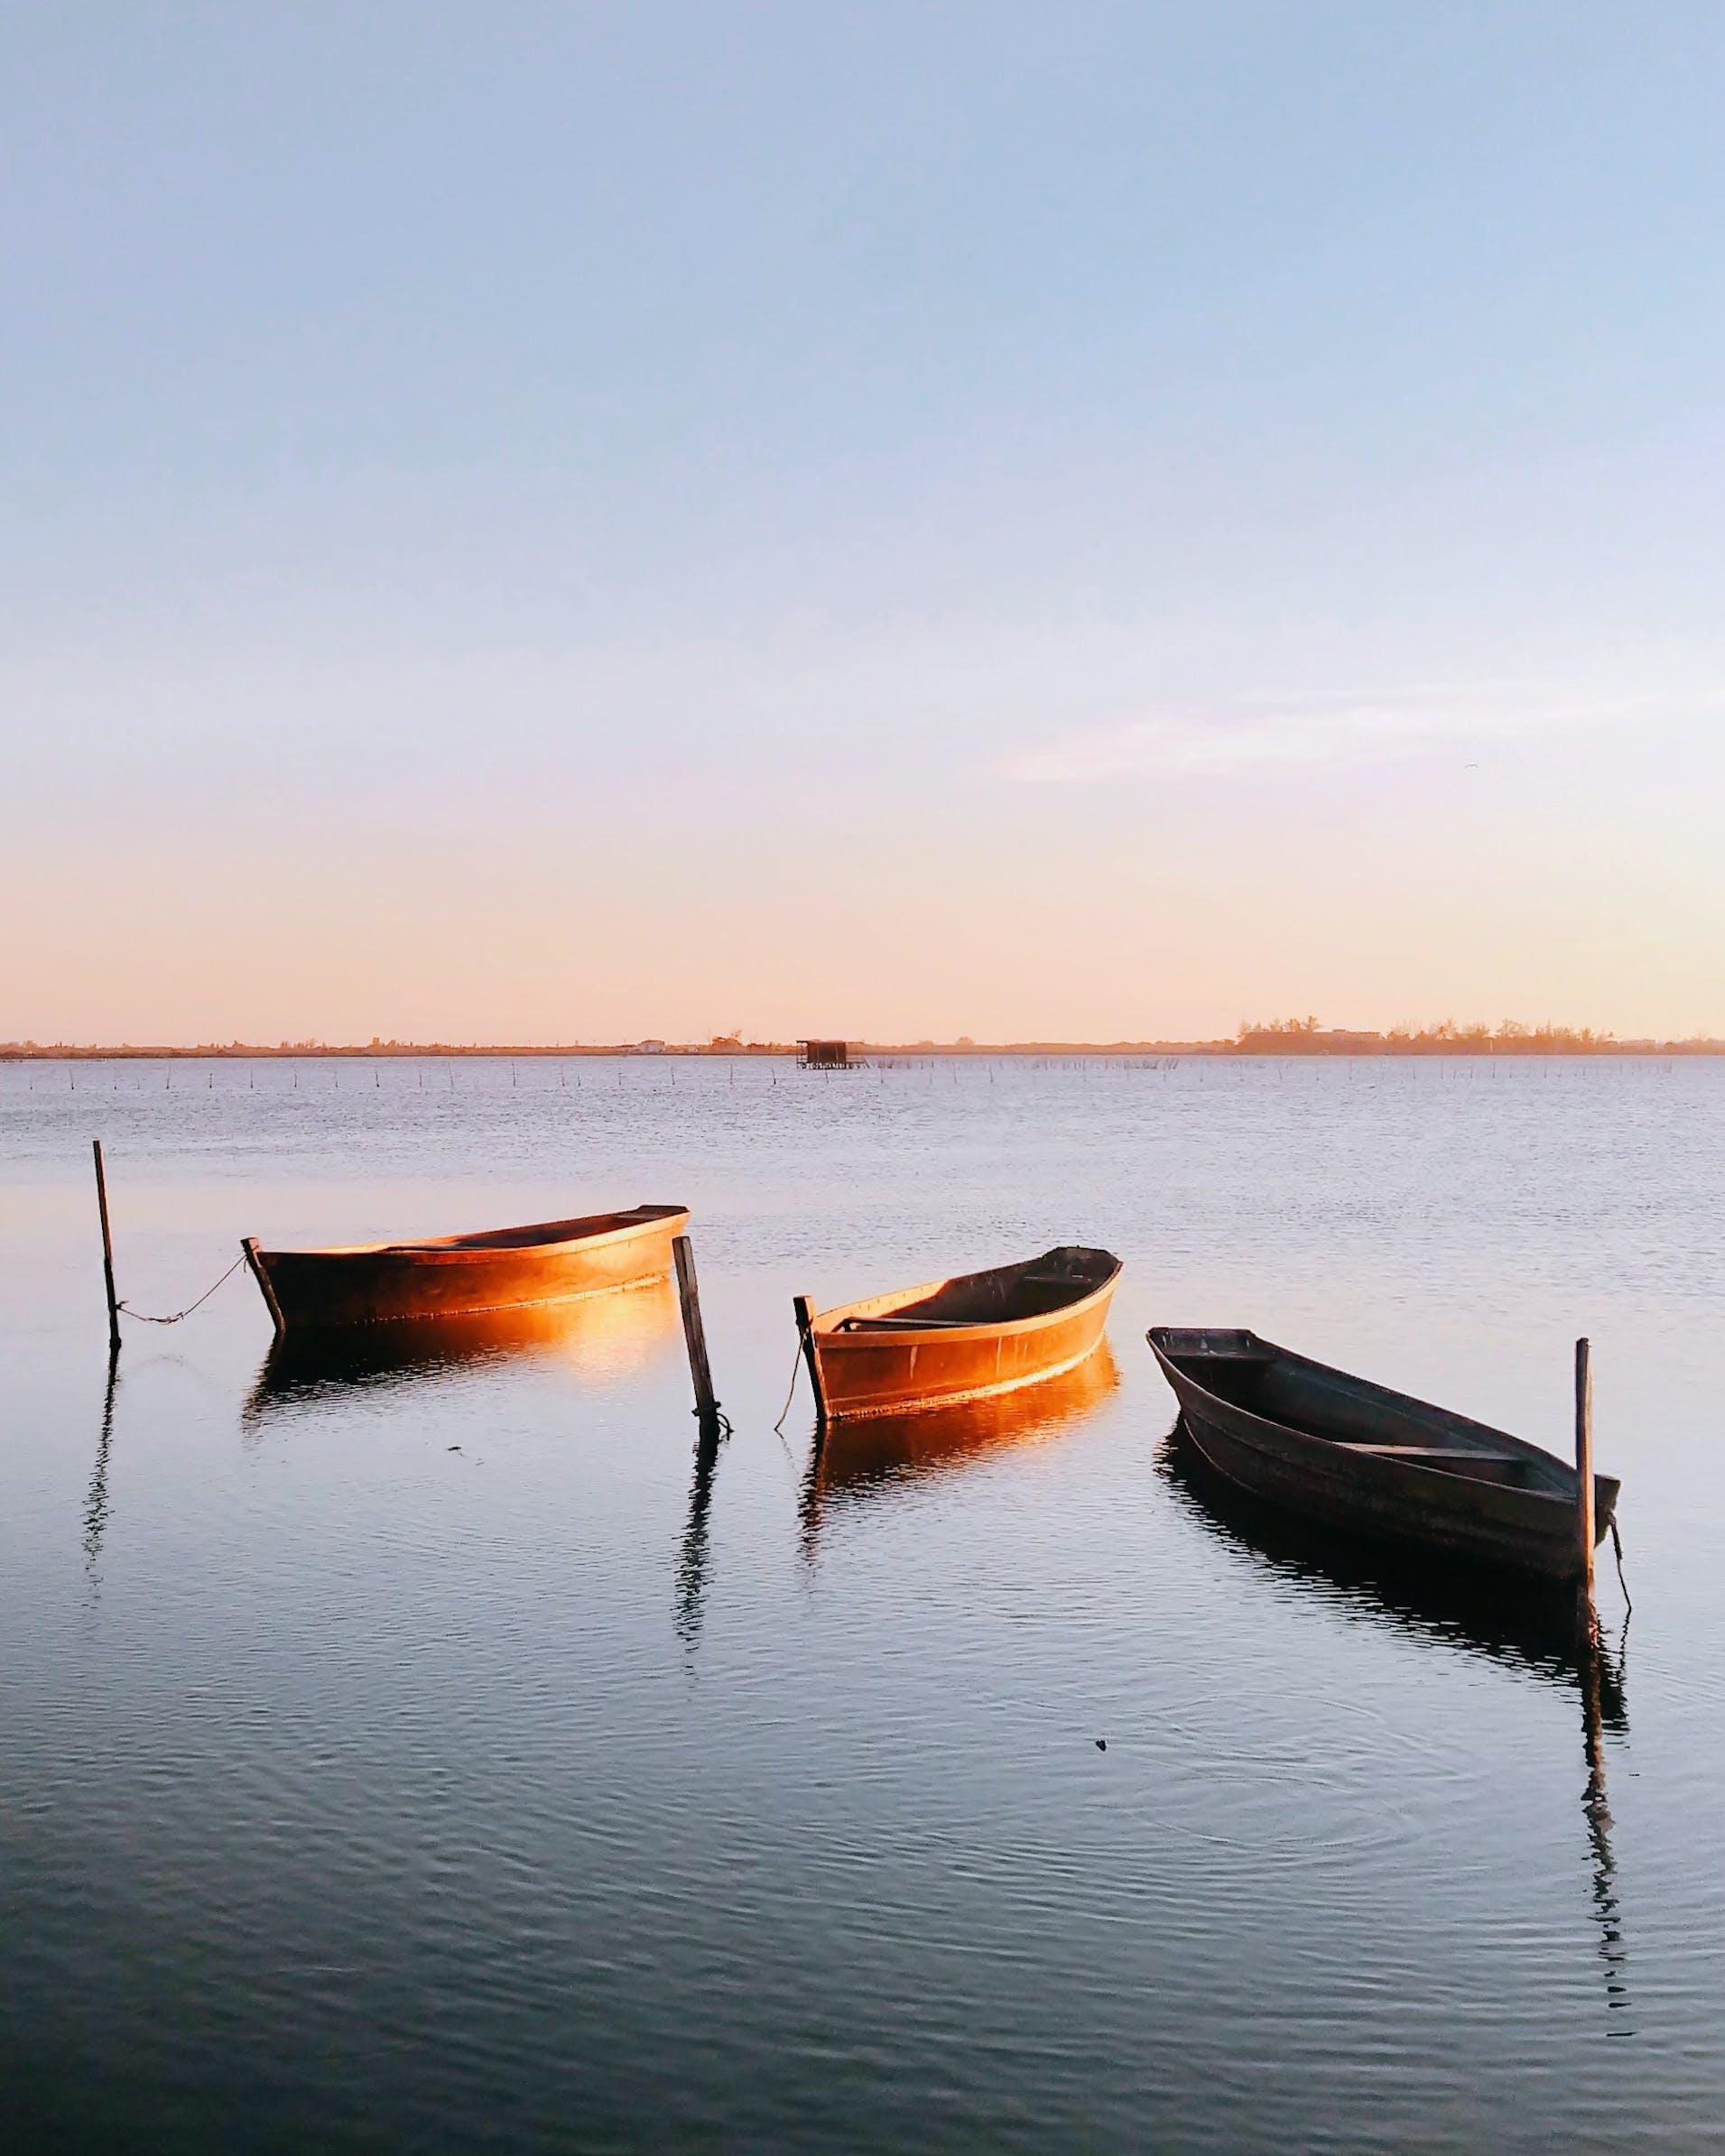 Three Brown Gondolas on Body of Water